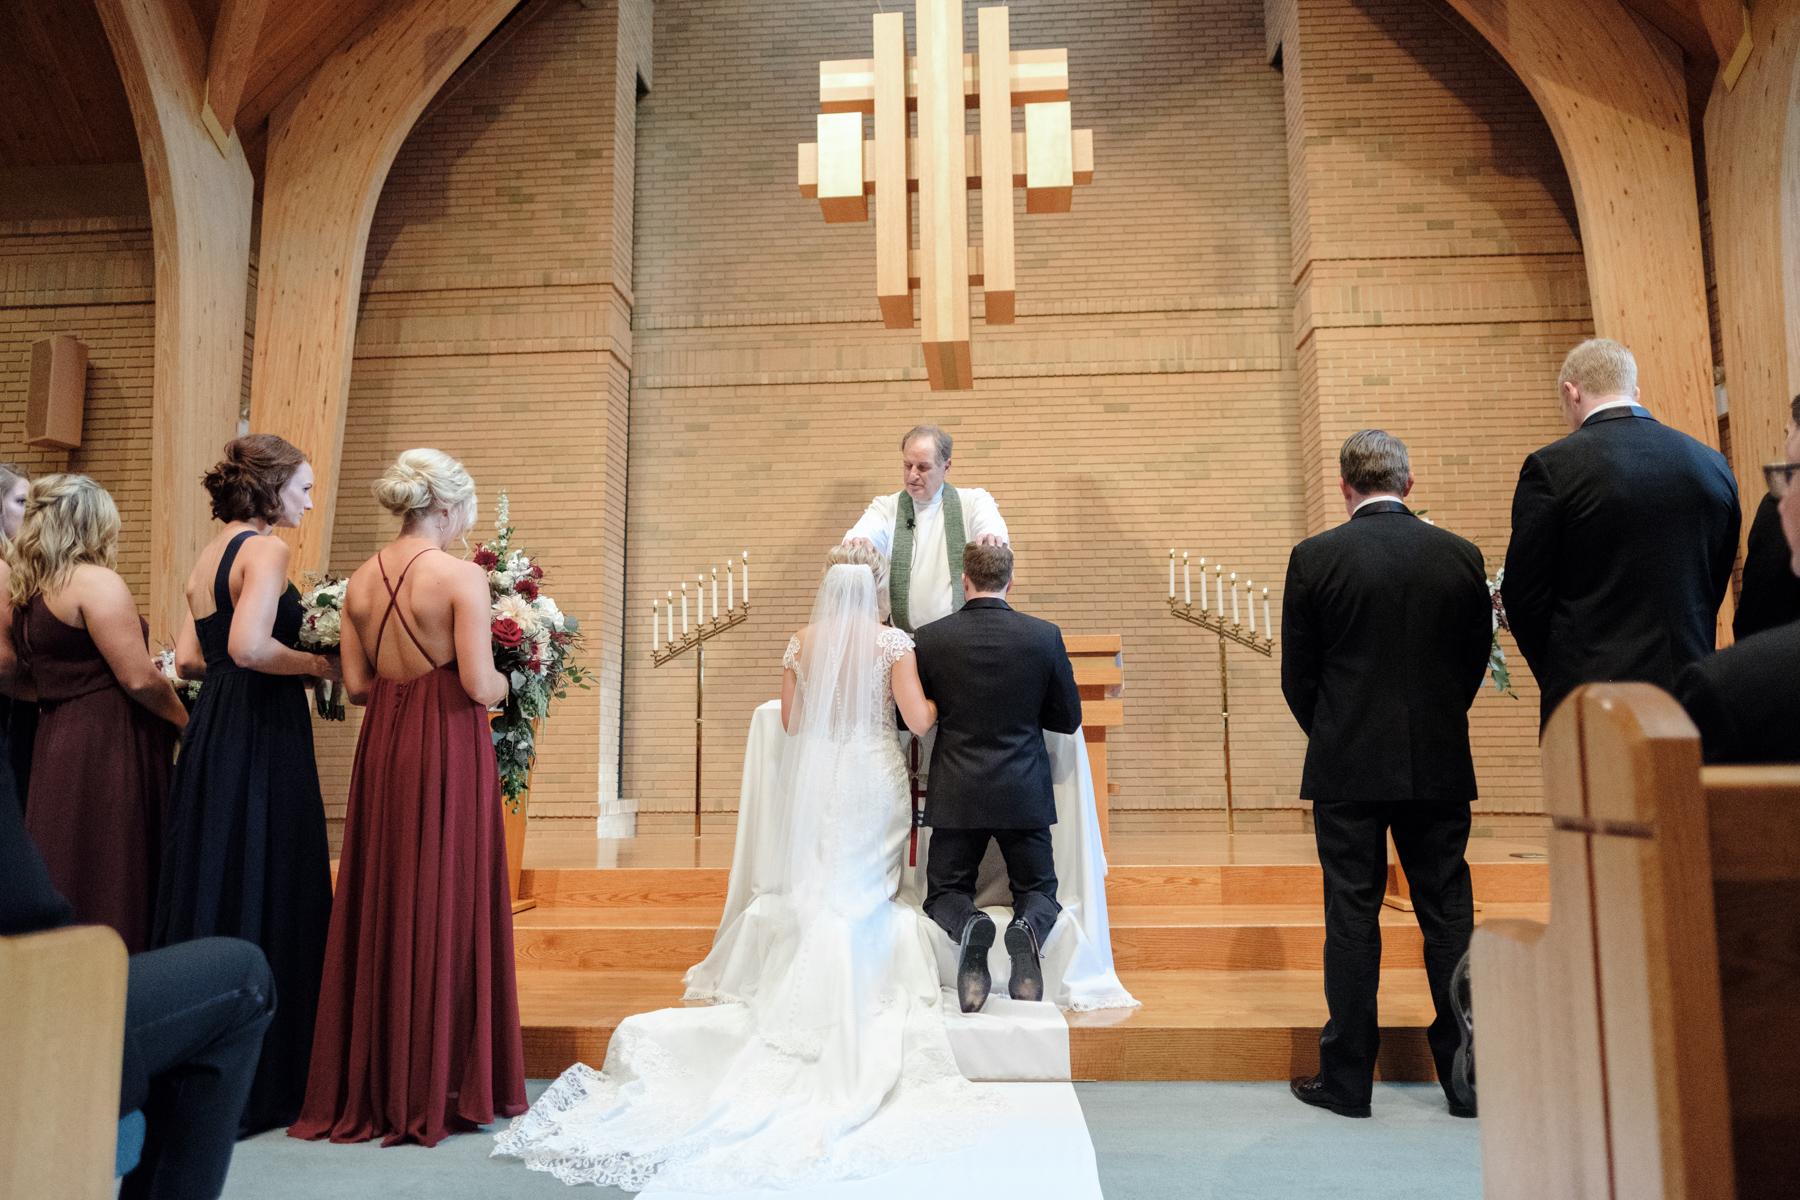 2017_BAP_KalliMatt_Gleneagles_CountryClub_Lemont_Wedding-46.jpg